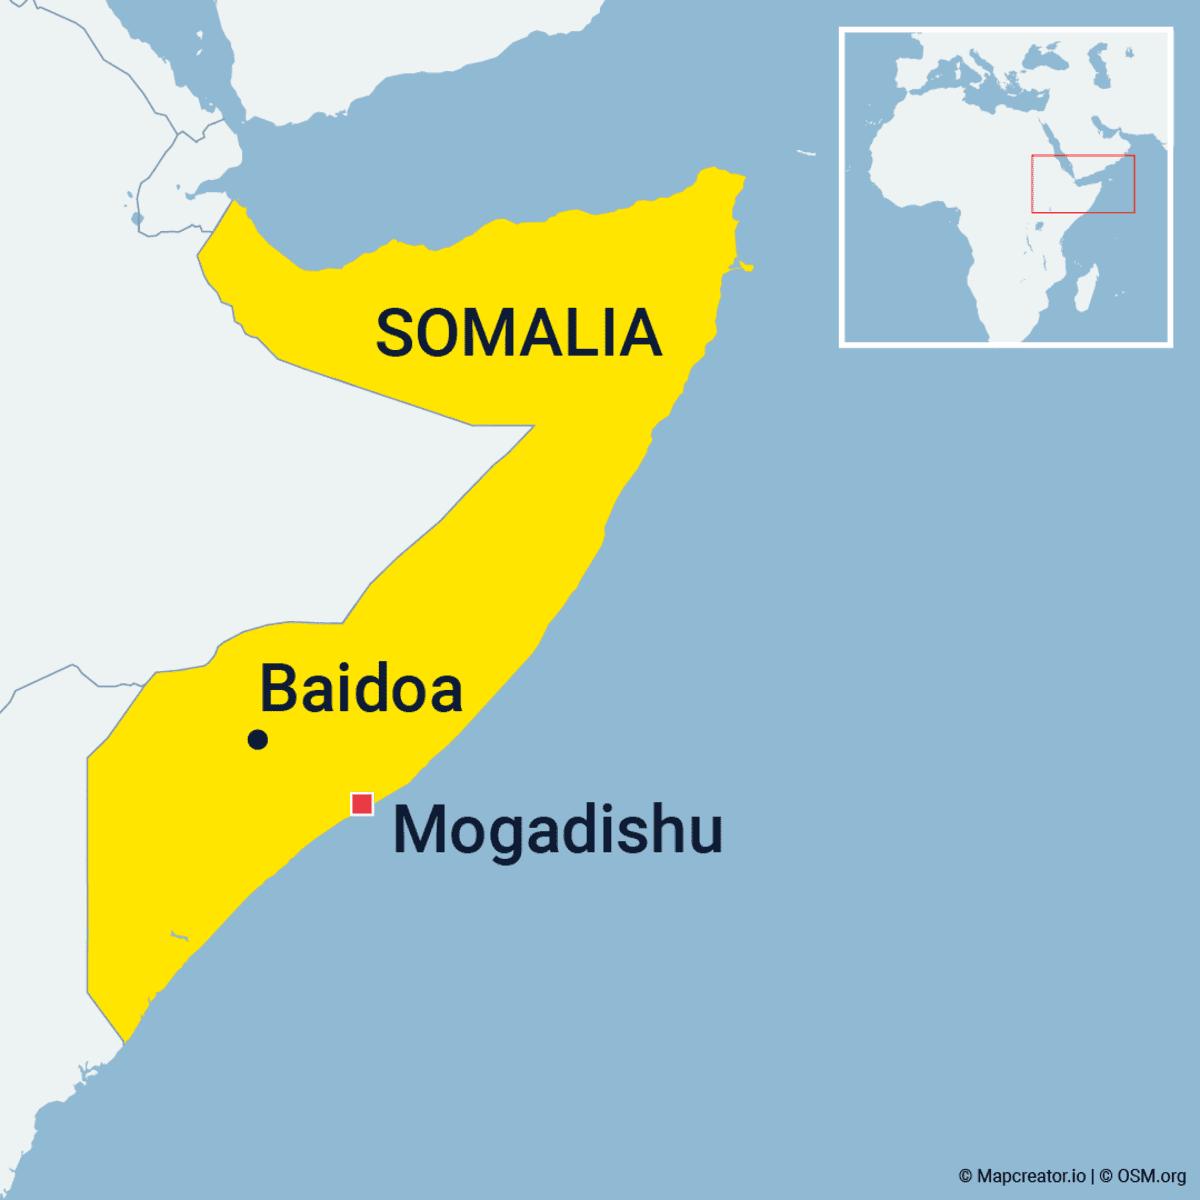 Somalia, Baidu kartalla.